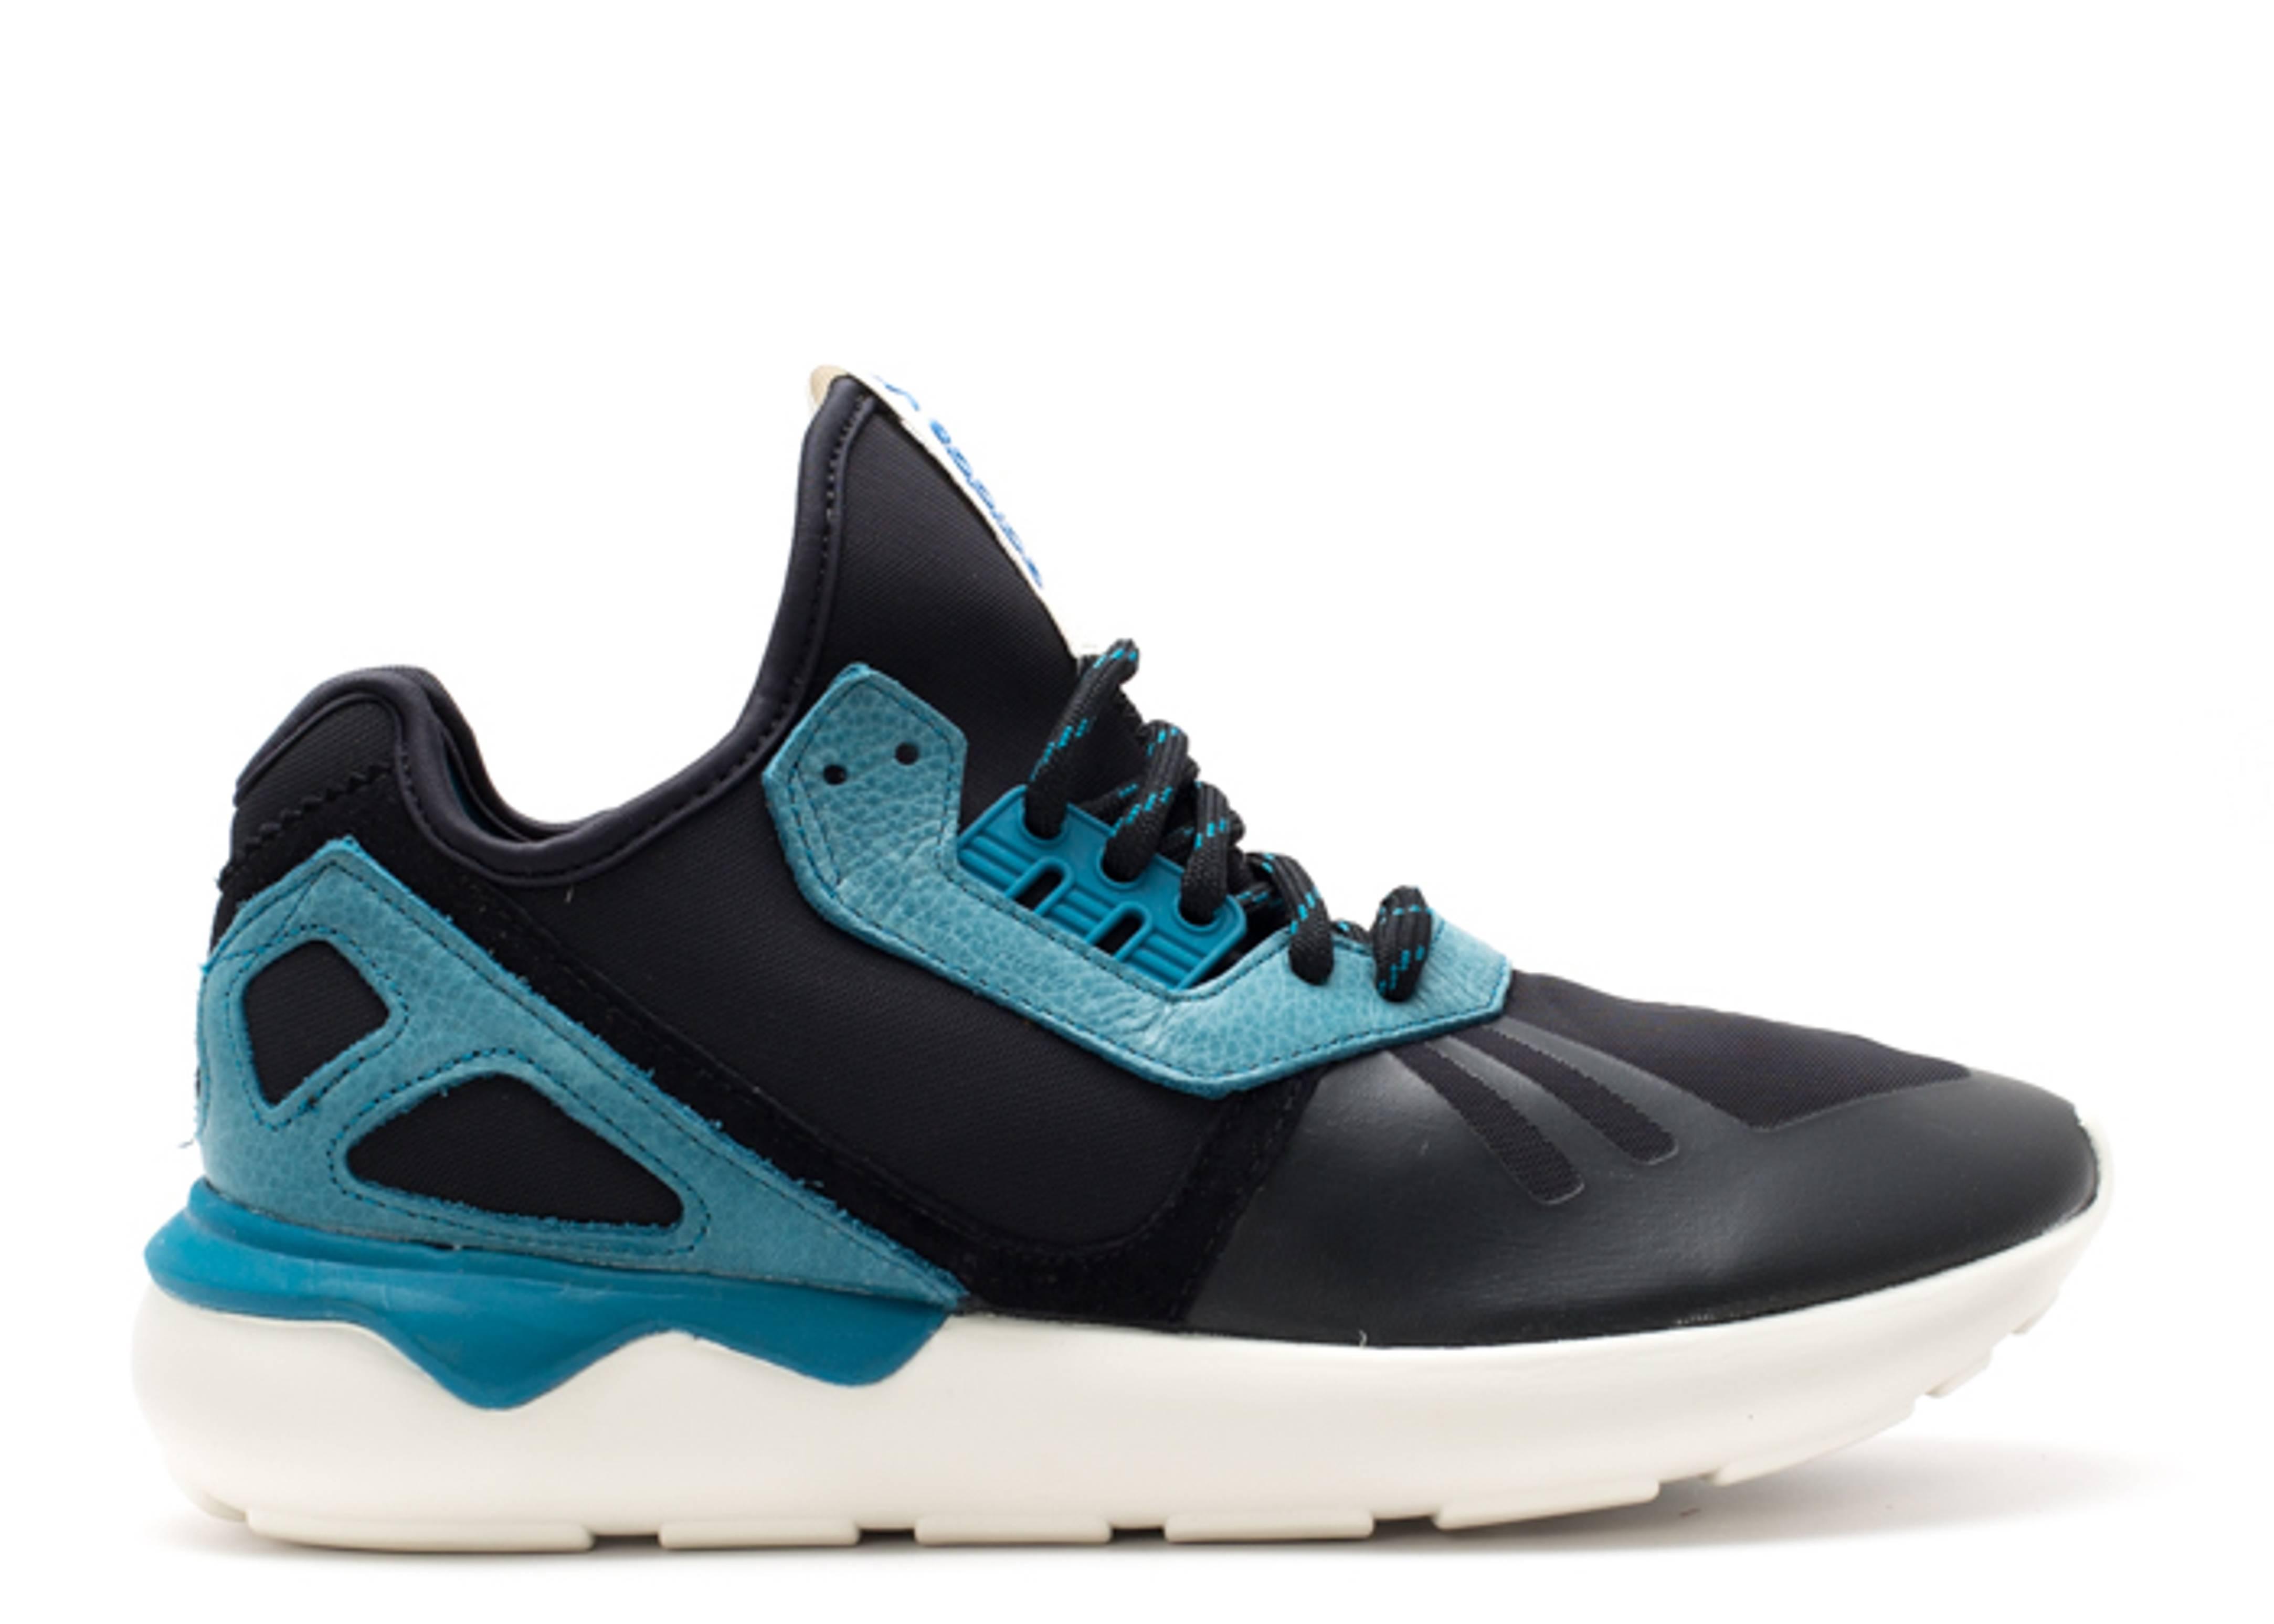 New Style Cblack Surpet Männer Schuhe Adidas Tubular